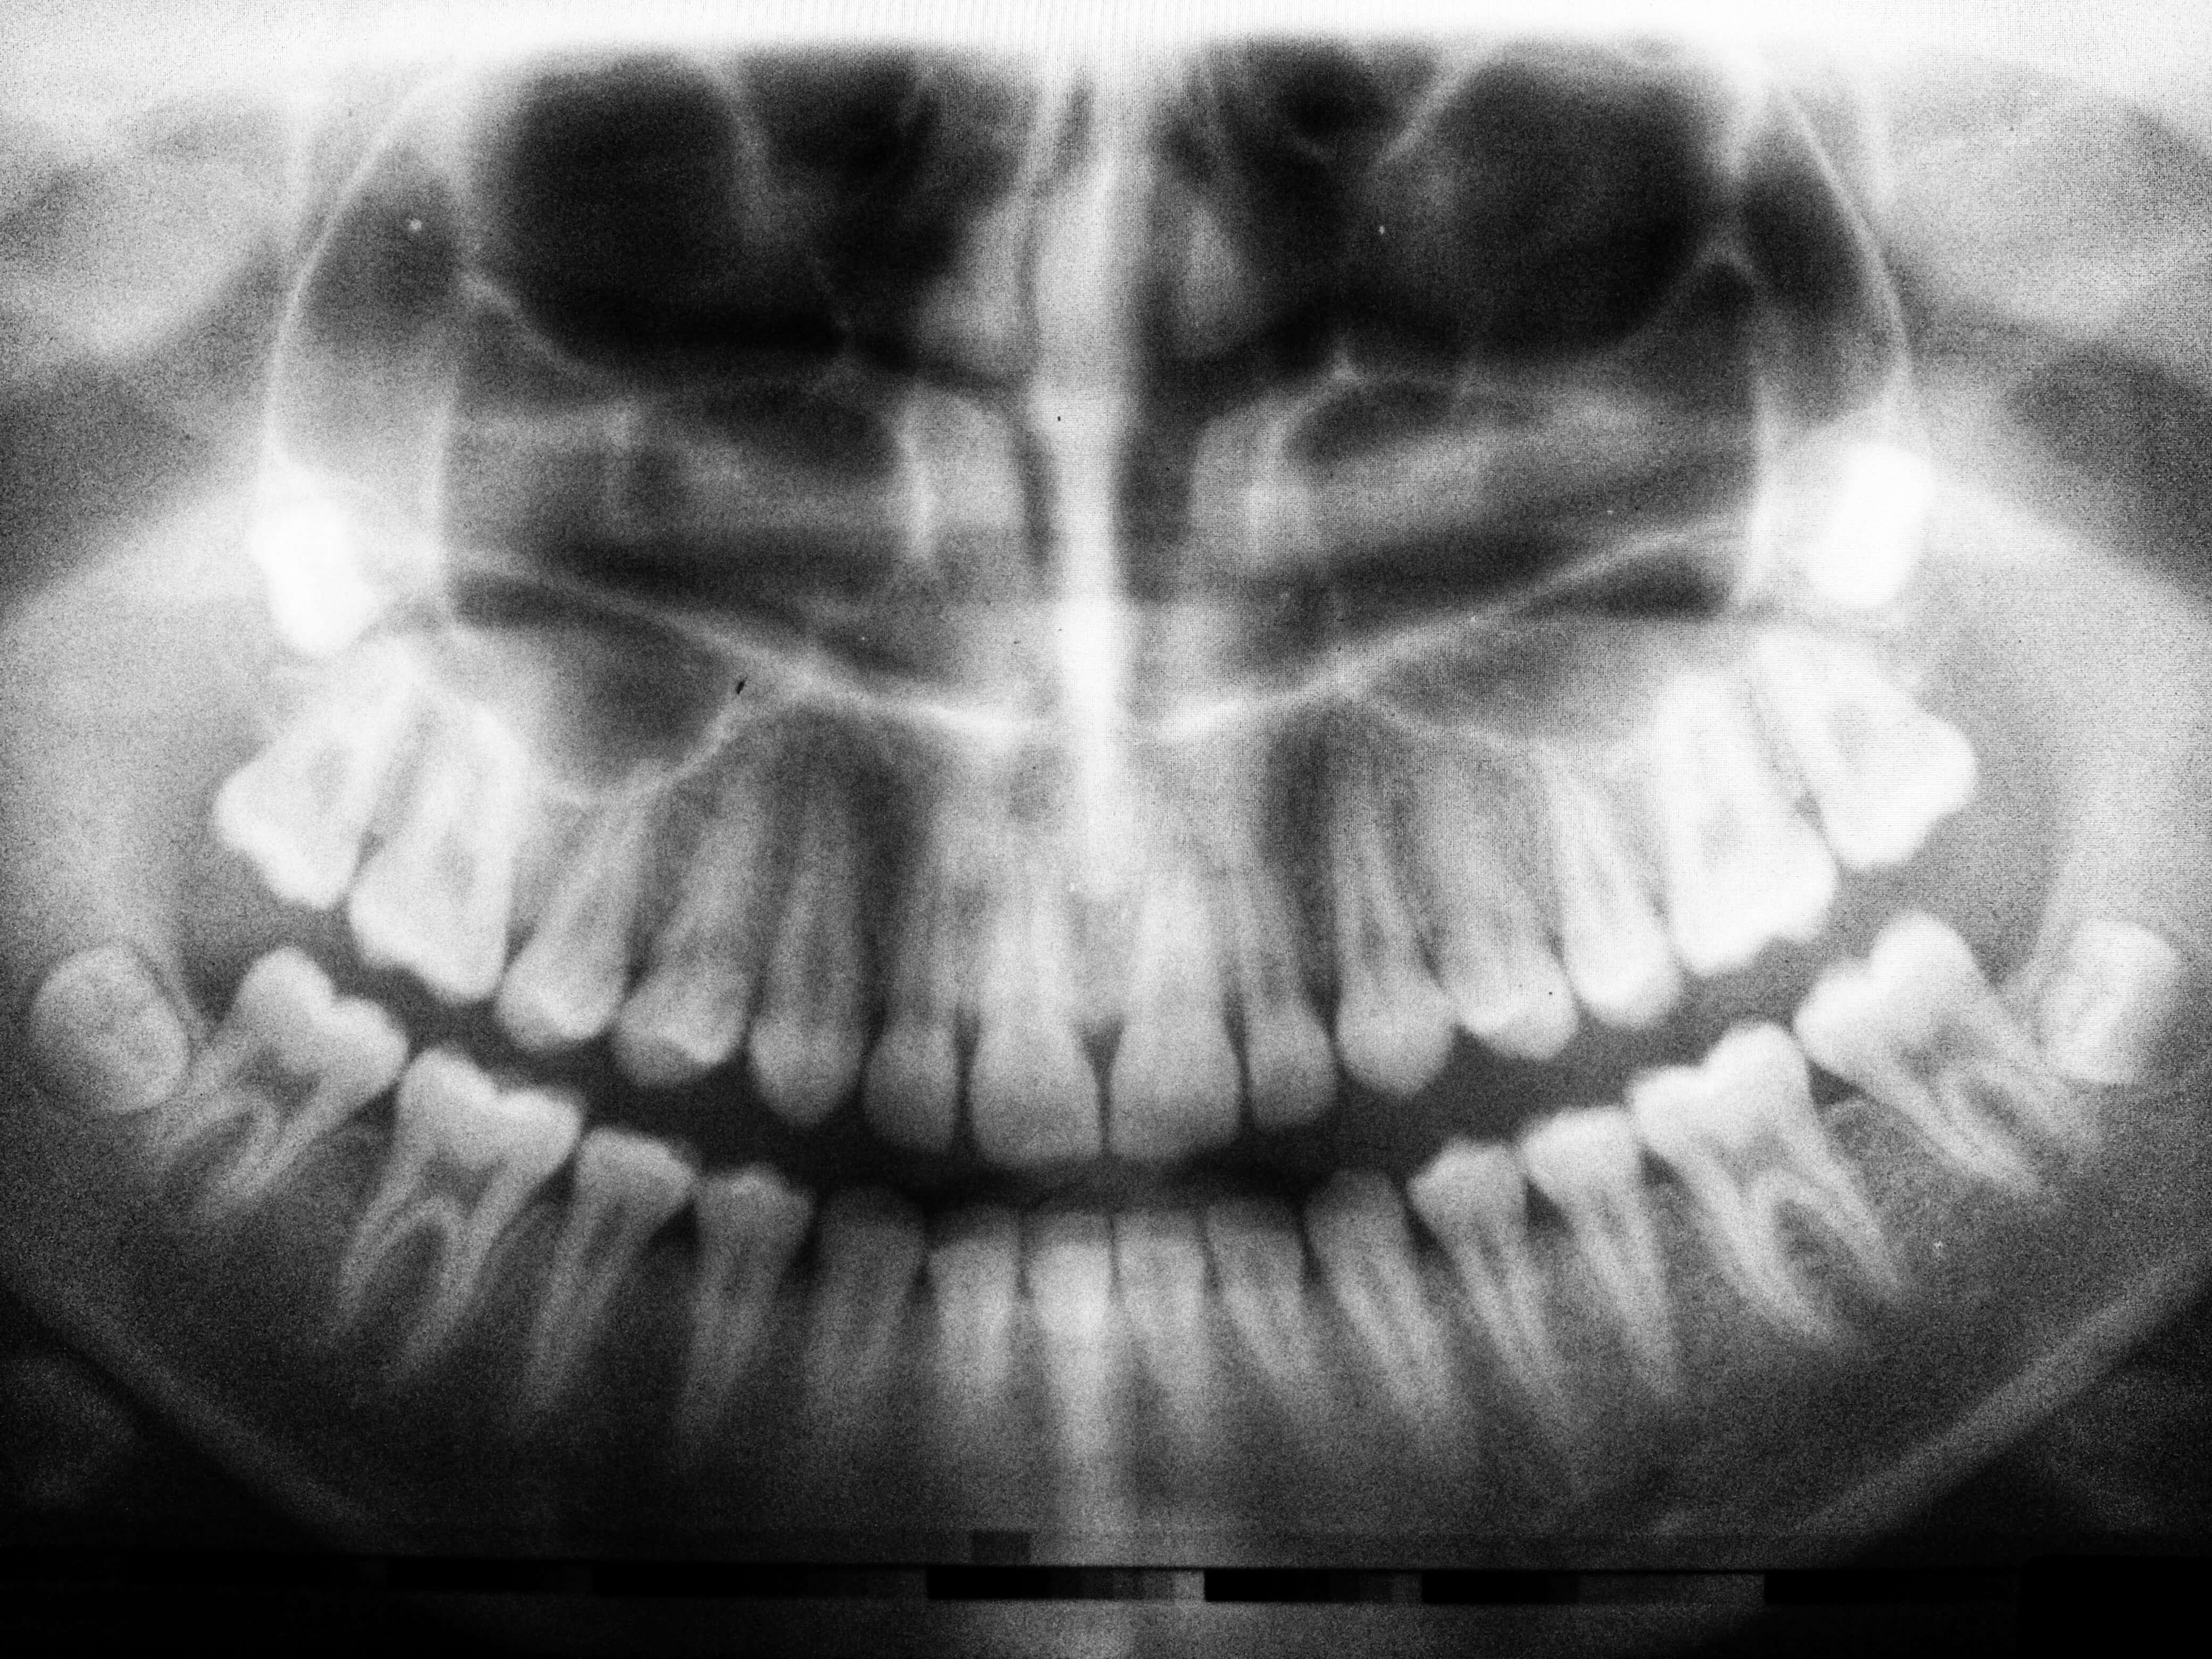 dental emergency care in erie pa